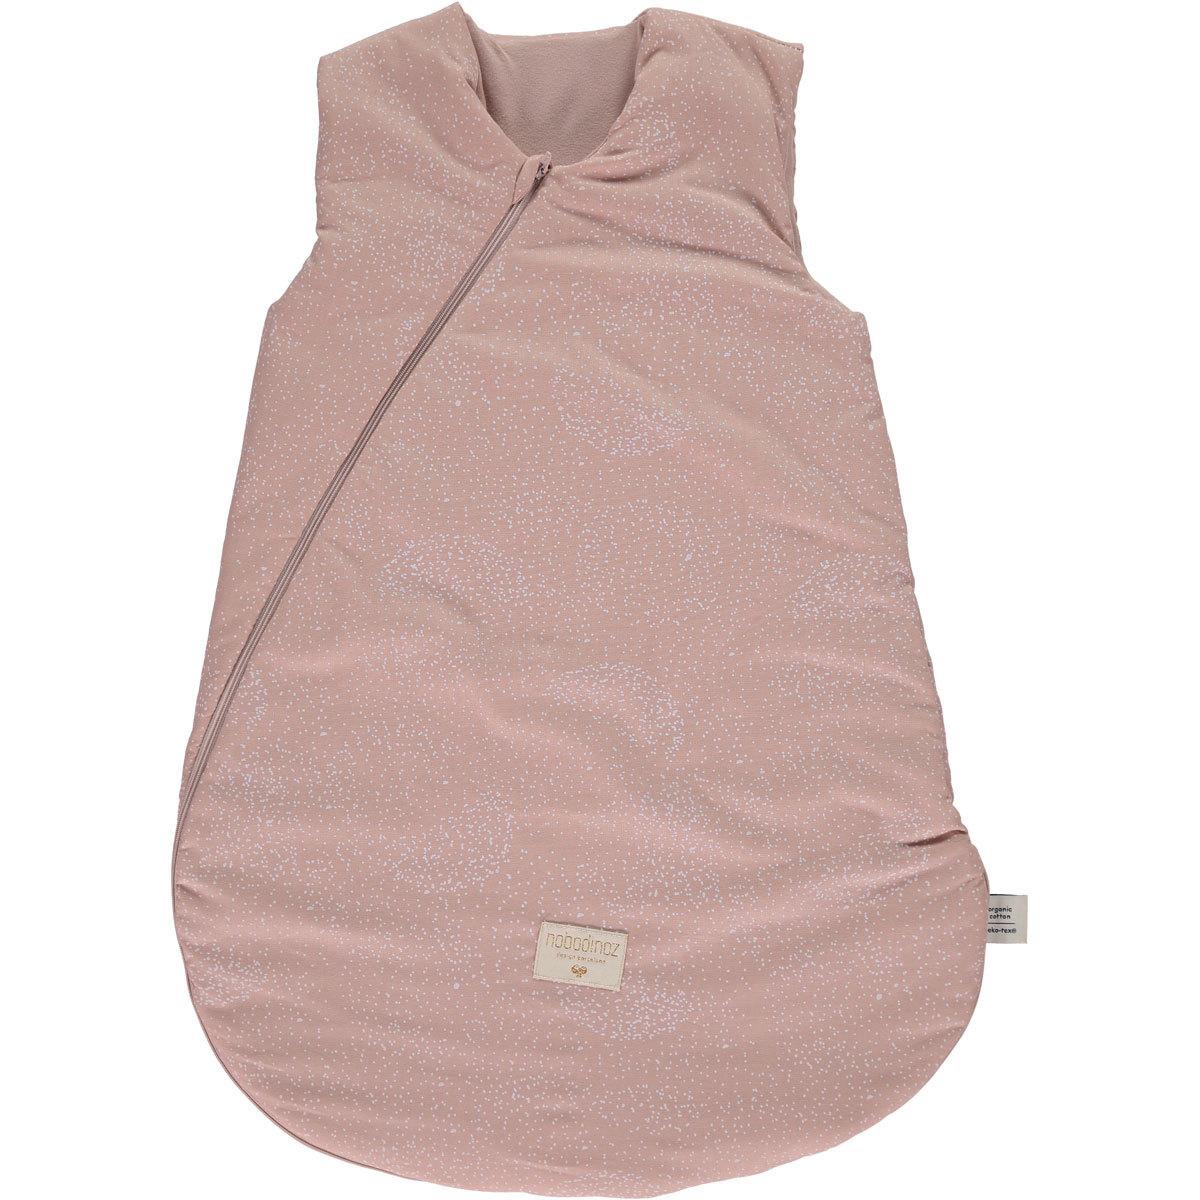 Gigoteuse Gigoteuse Cocoon White Bubble & Misty Pink - 0/6 Mois Gigoteuse Cocoon White Bubble & Misty Pink - 0/6 Mois